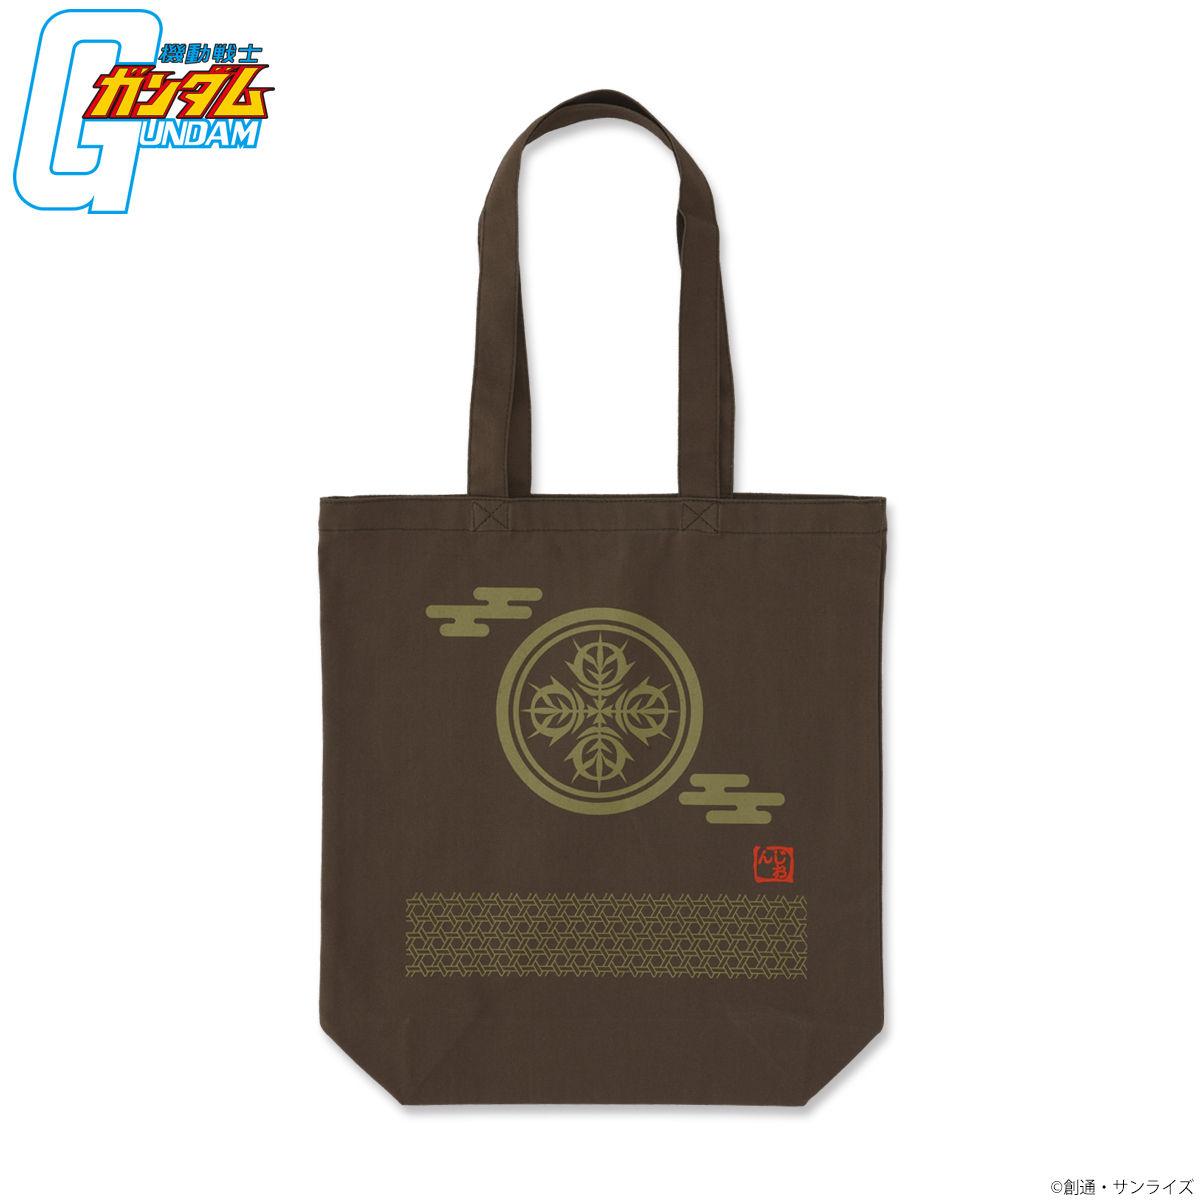 Mobile Suit Gundam Japanese Family Crest Tote Bag